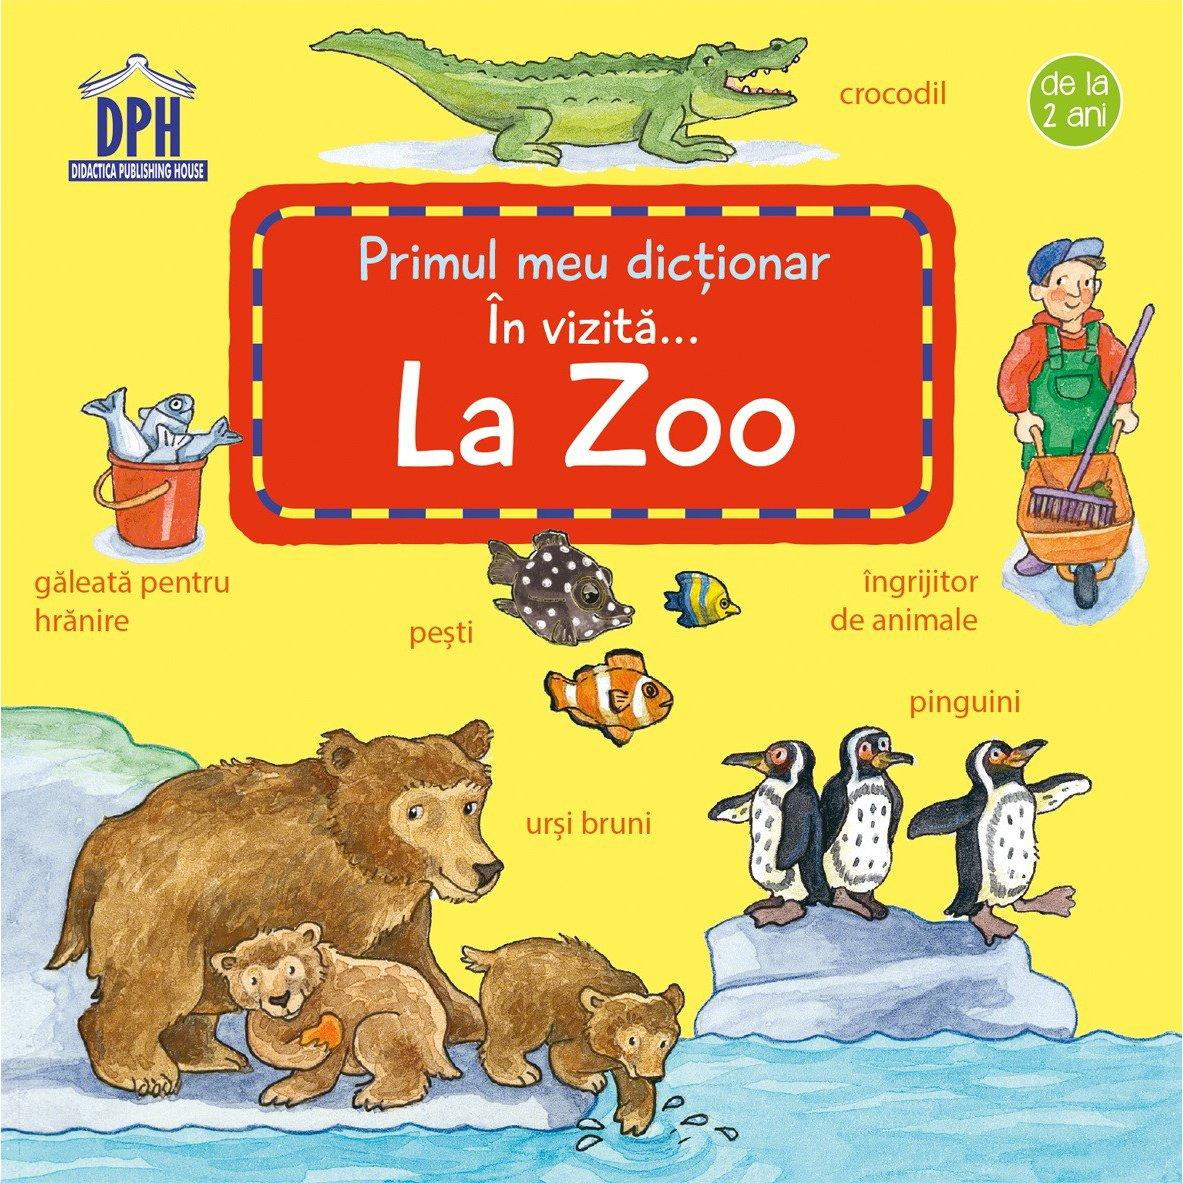 Carte In vizita... la Zoo, Editura DPH